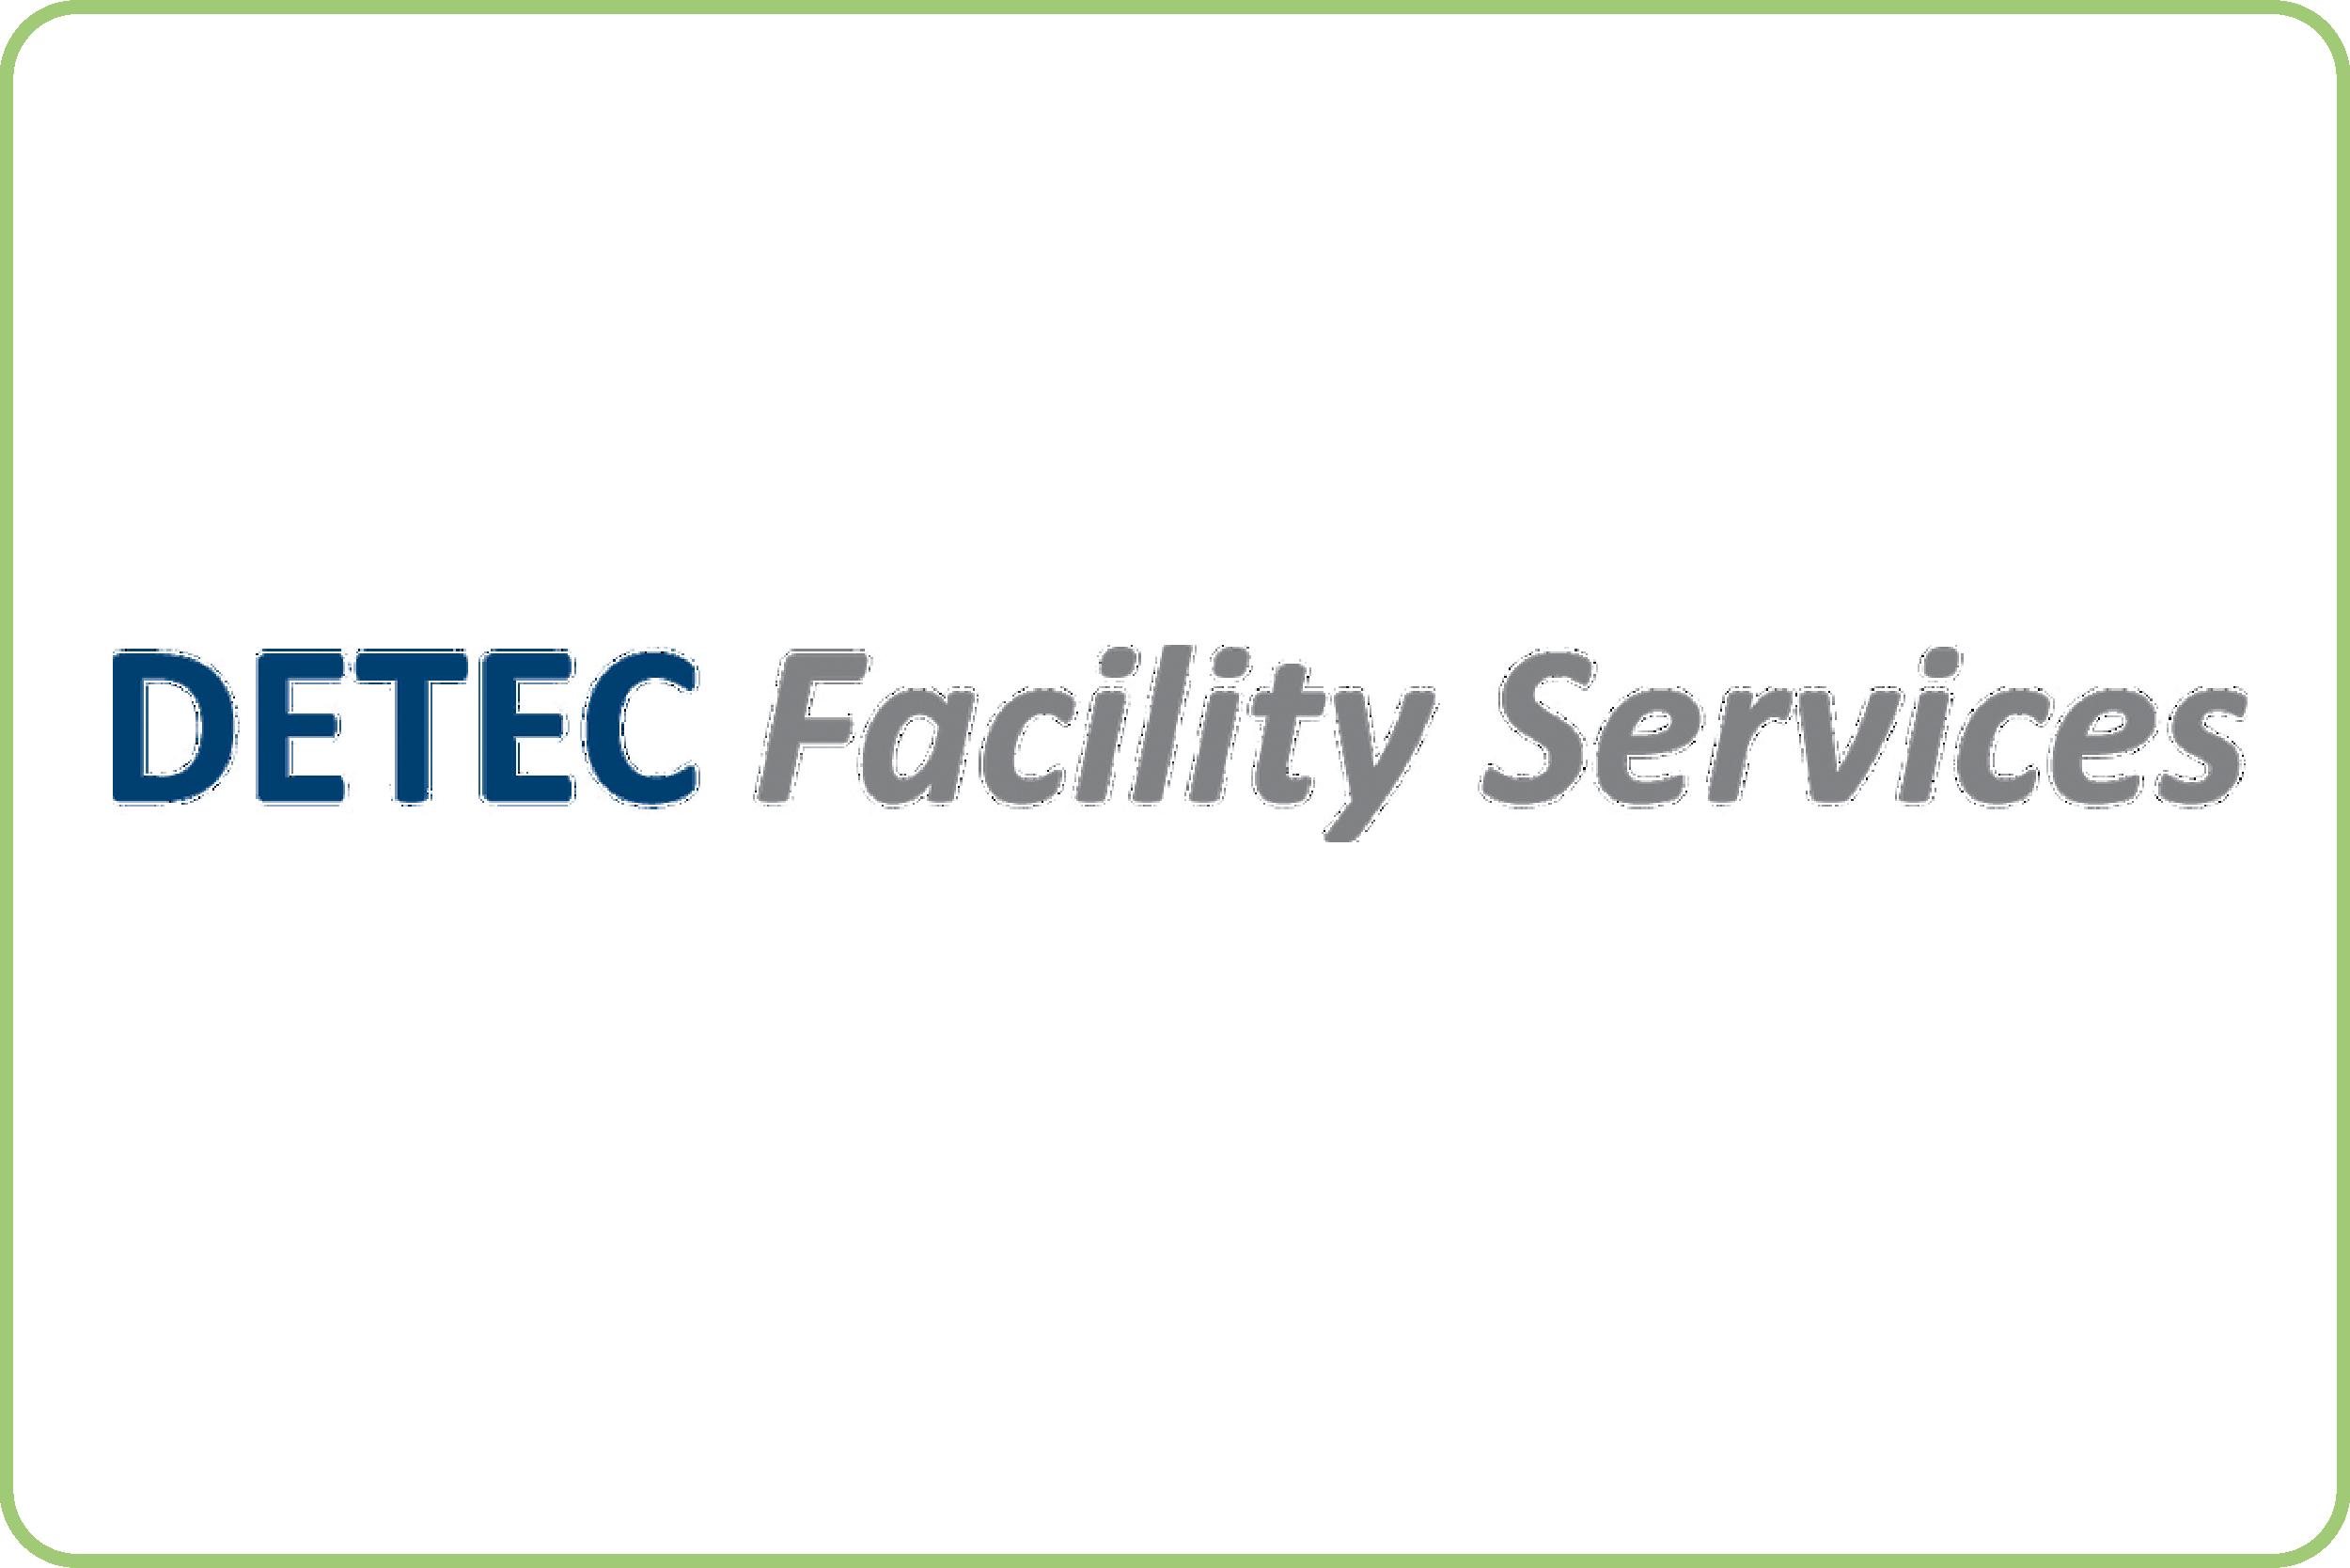 DETEC Facility Services